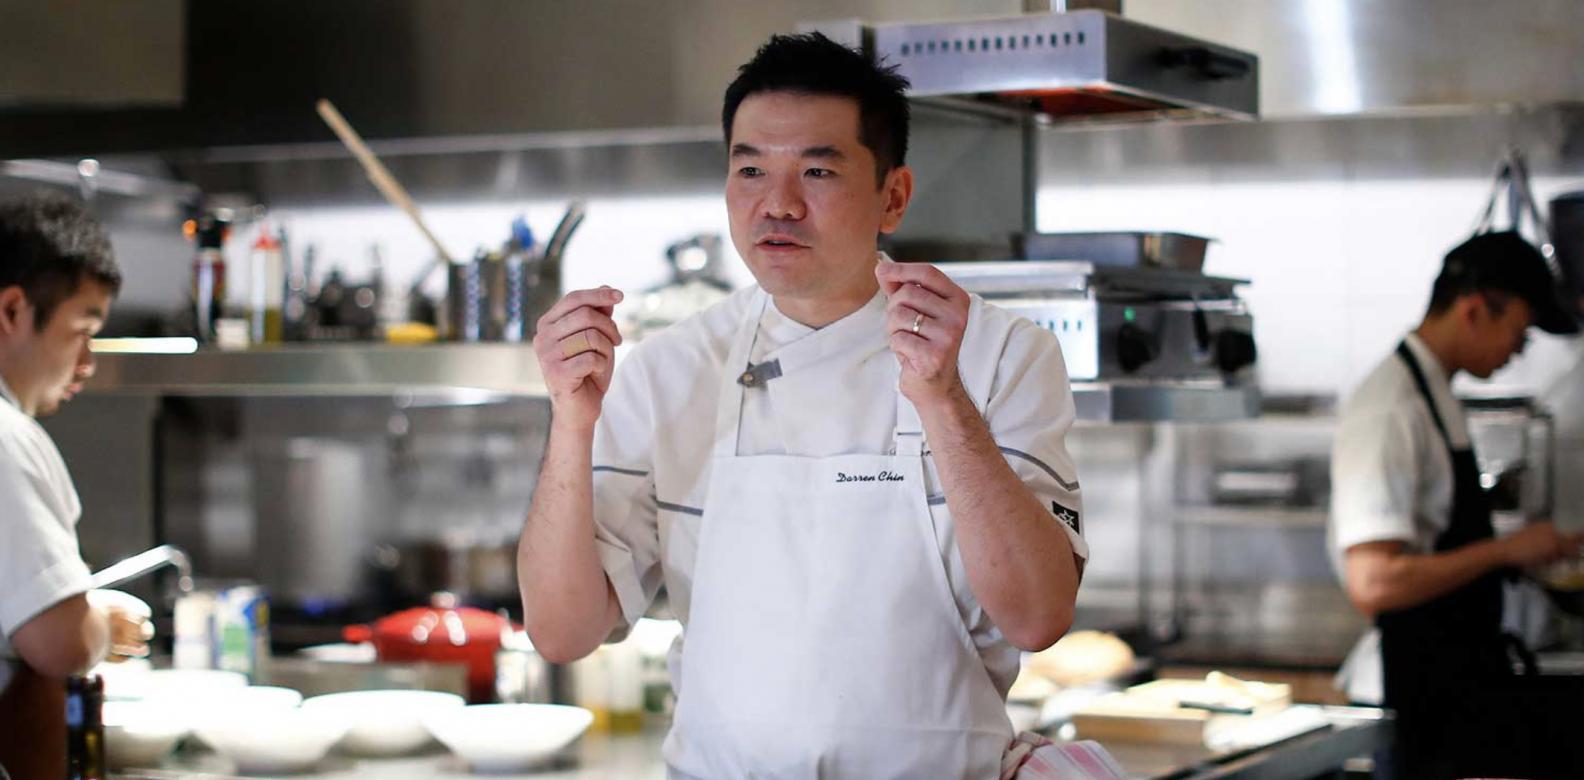 Darren Chin, chef-patron of Bref. Photo: Courtesy of Moet Hennessy Diageo.